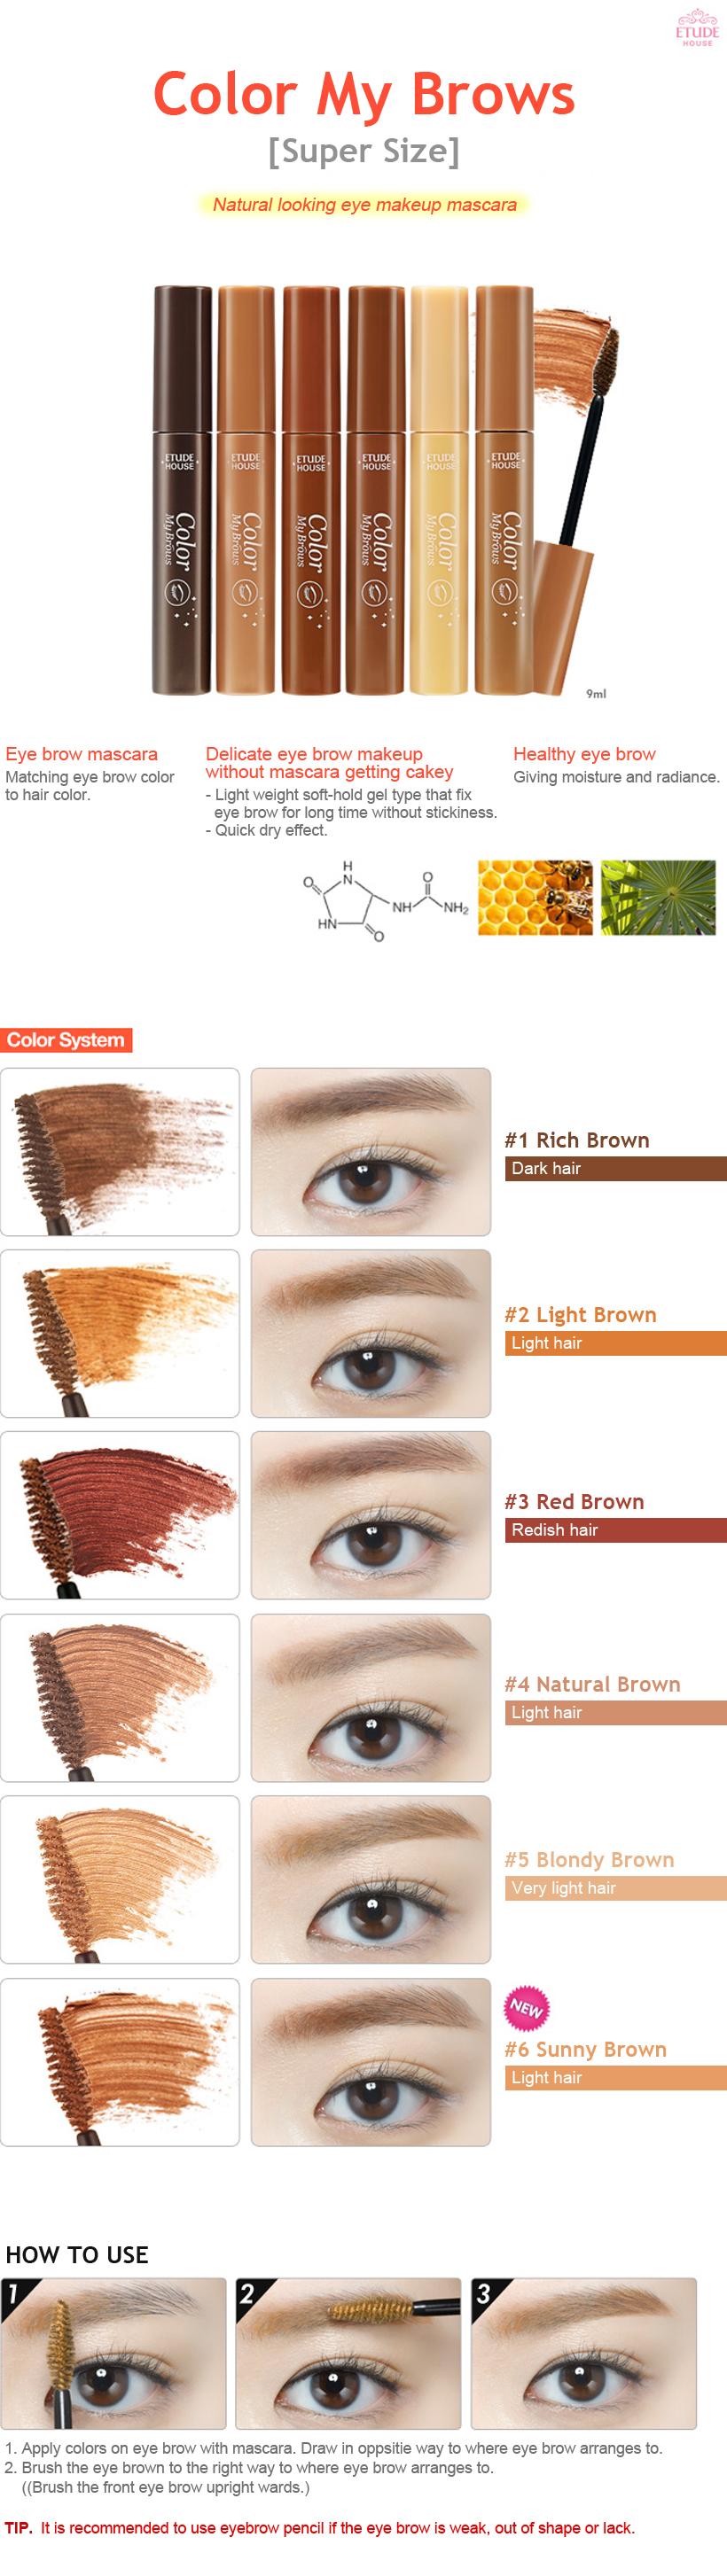 colormybrows-supersize.jpg